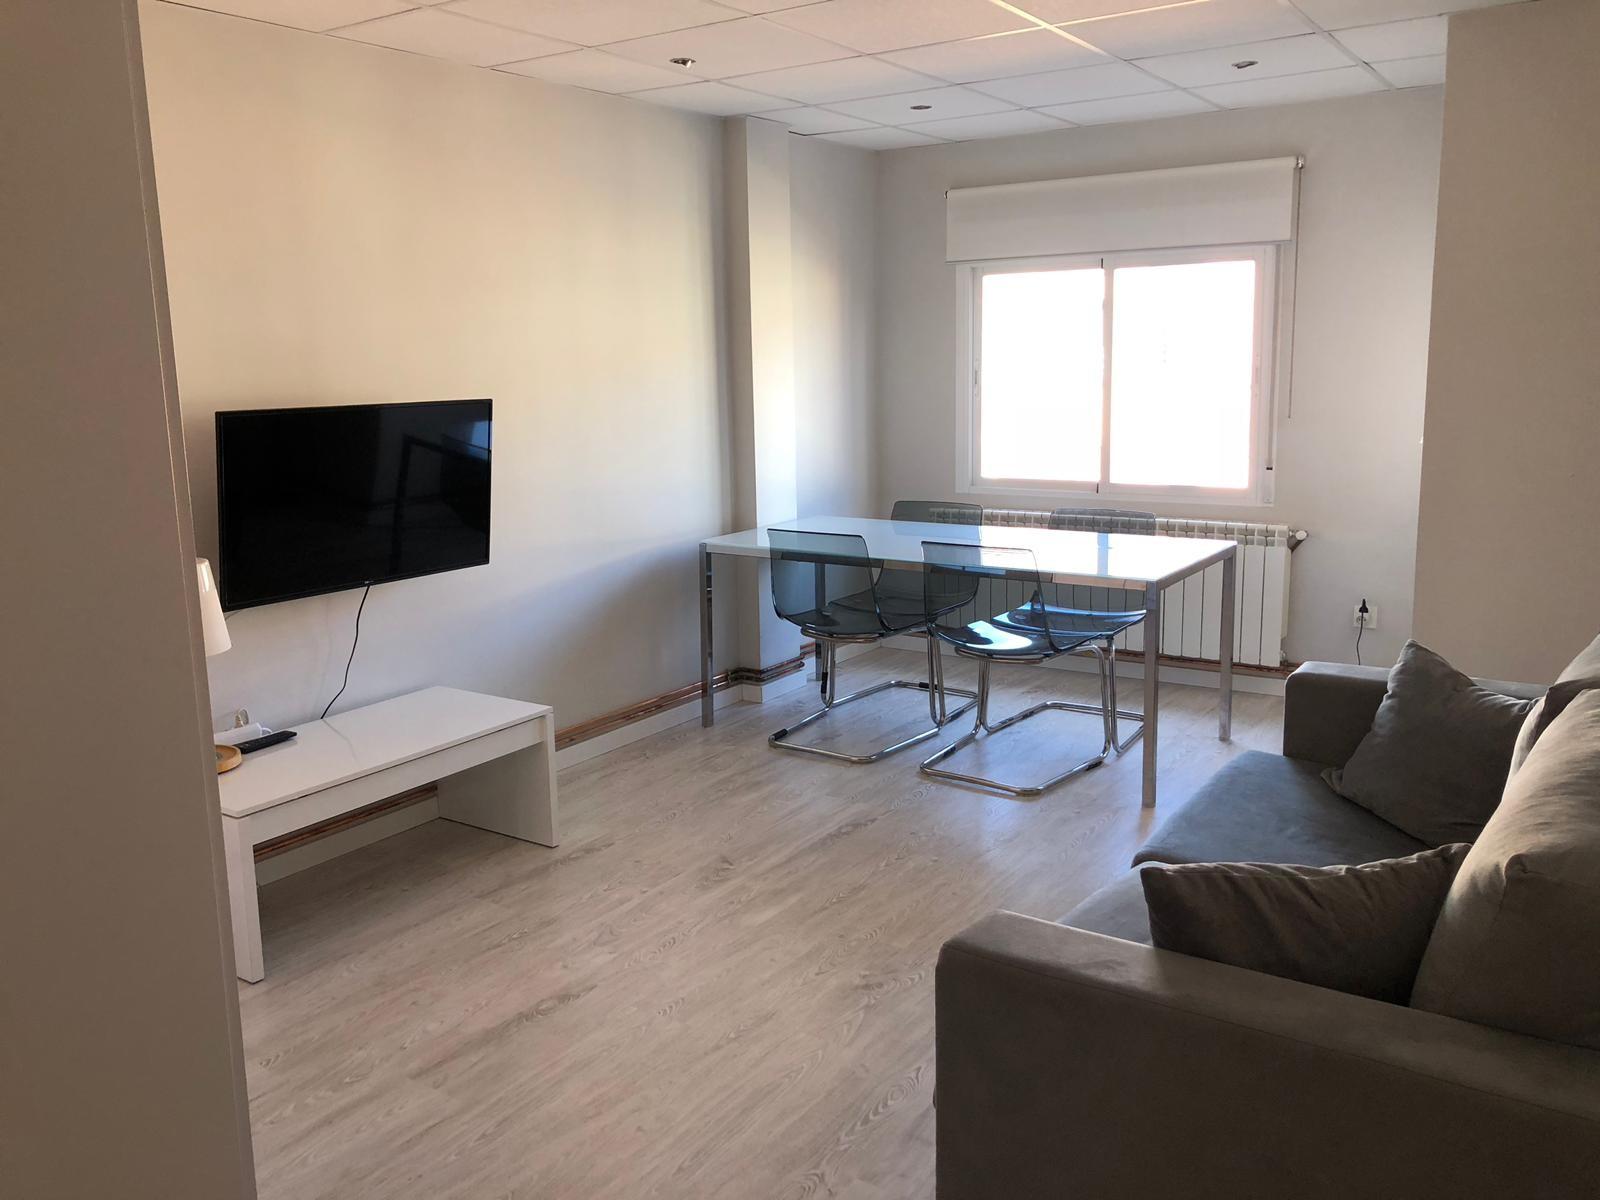 room-renting-renovated-apartment-1c72431